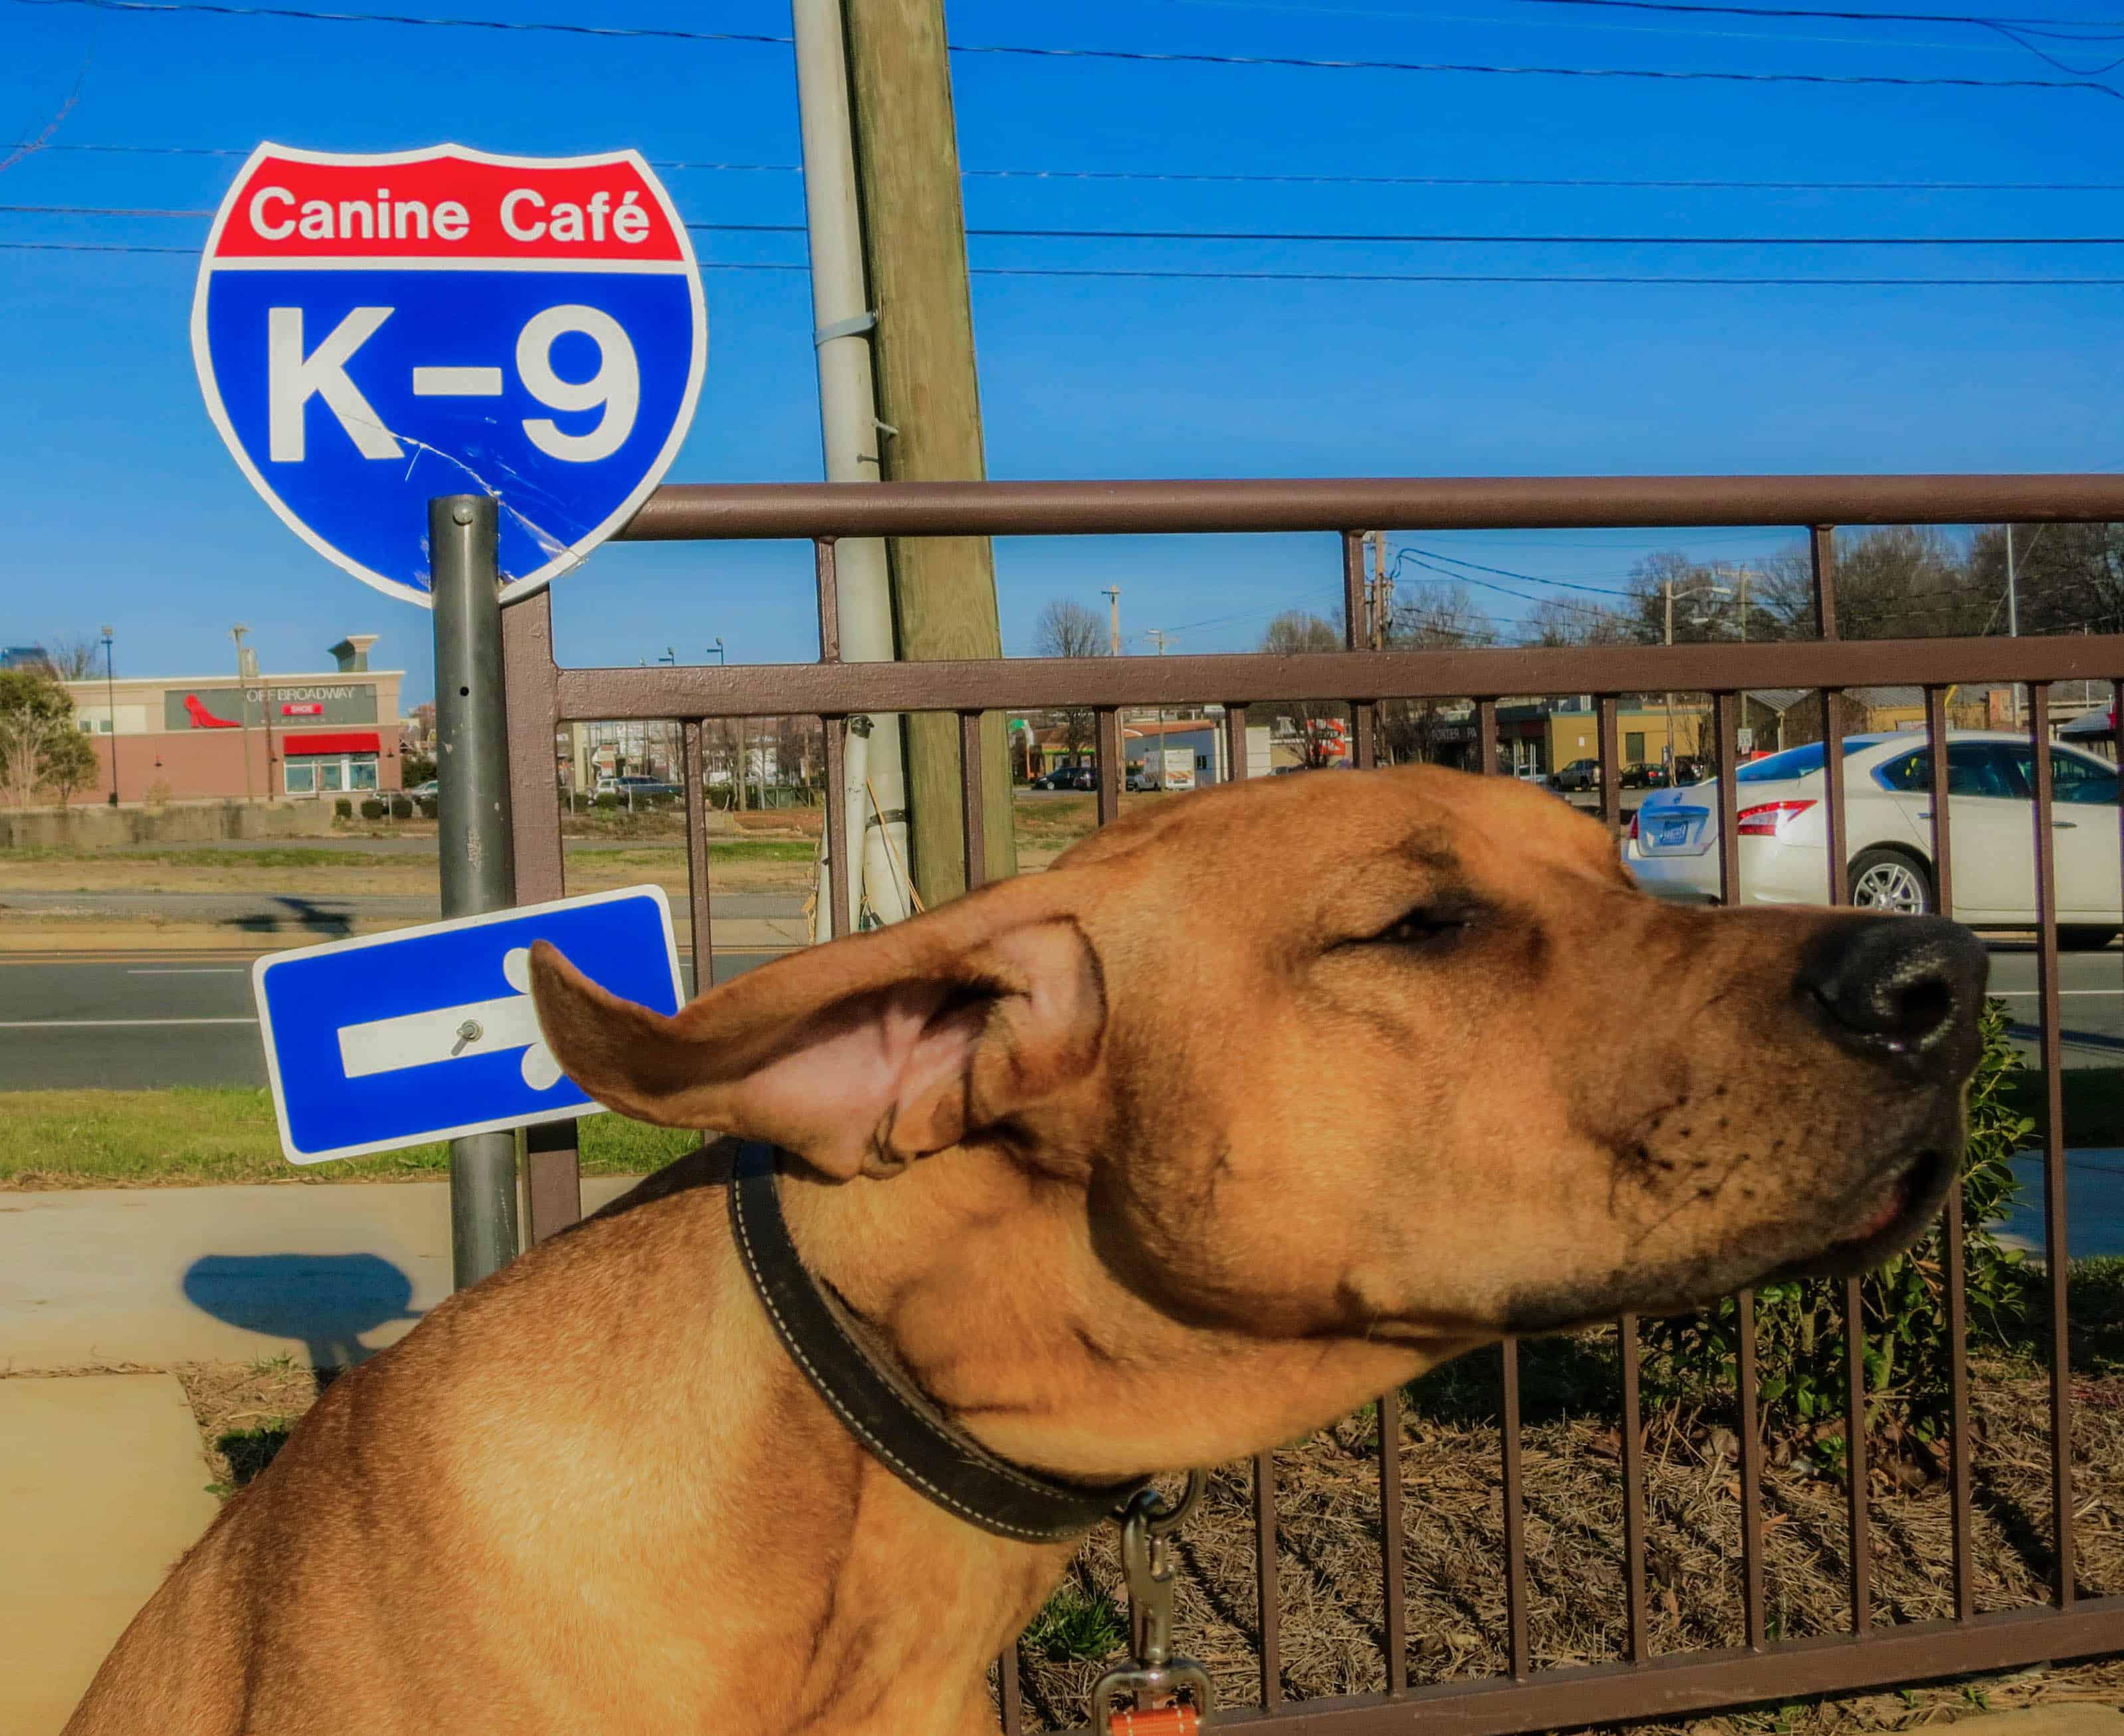 Rhodesian Ridgeback, dog adventure, traveling with you dog, pet friendly travel, dog photos